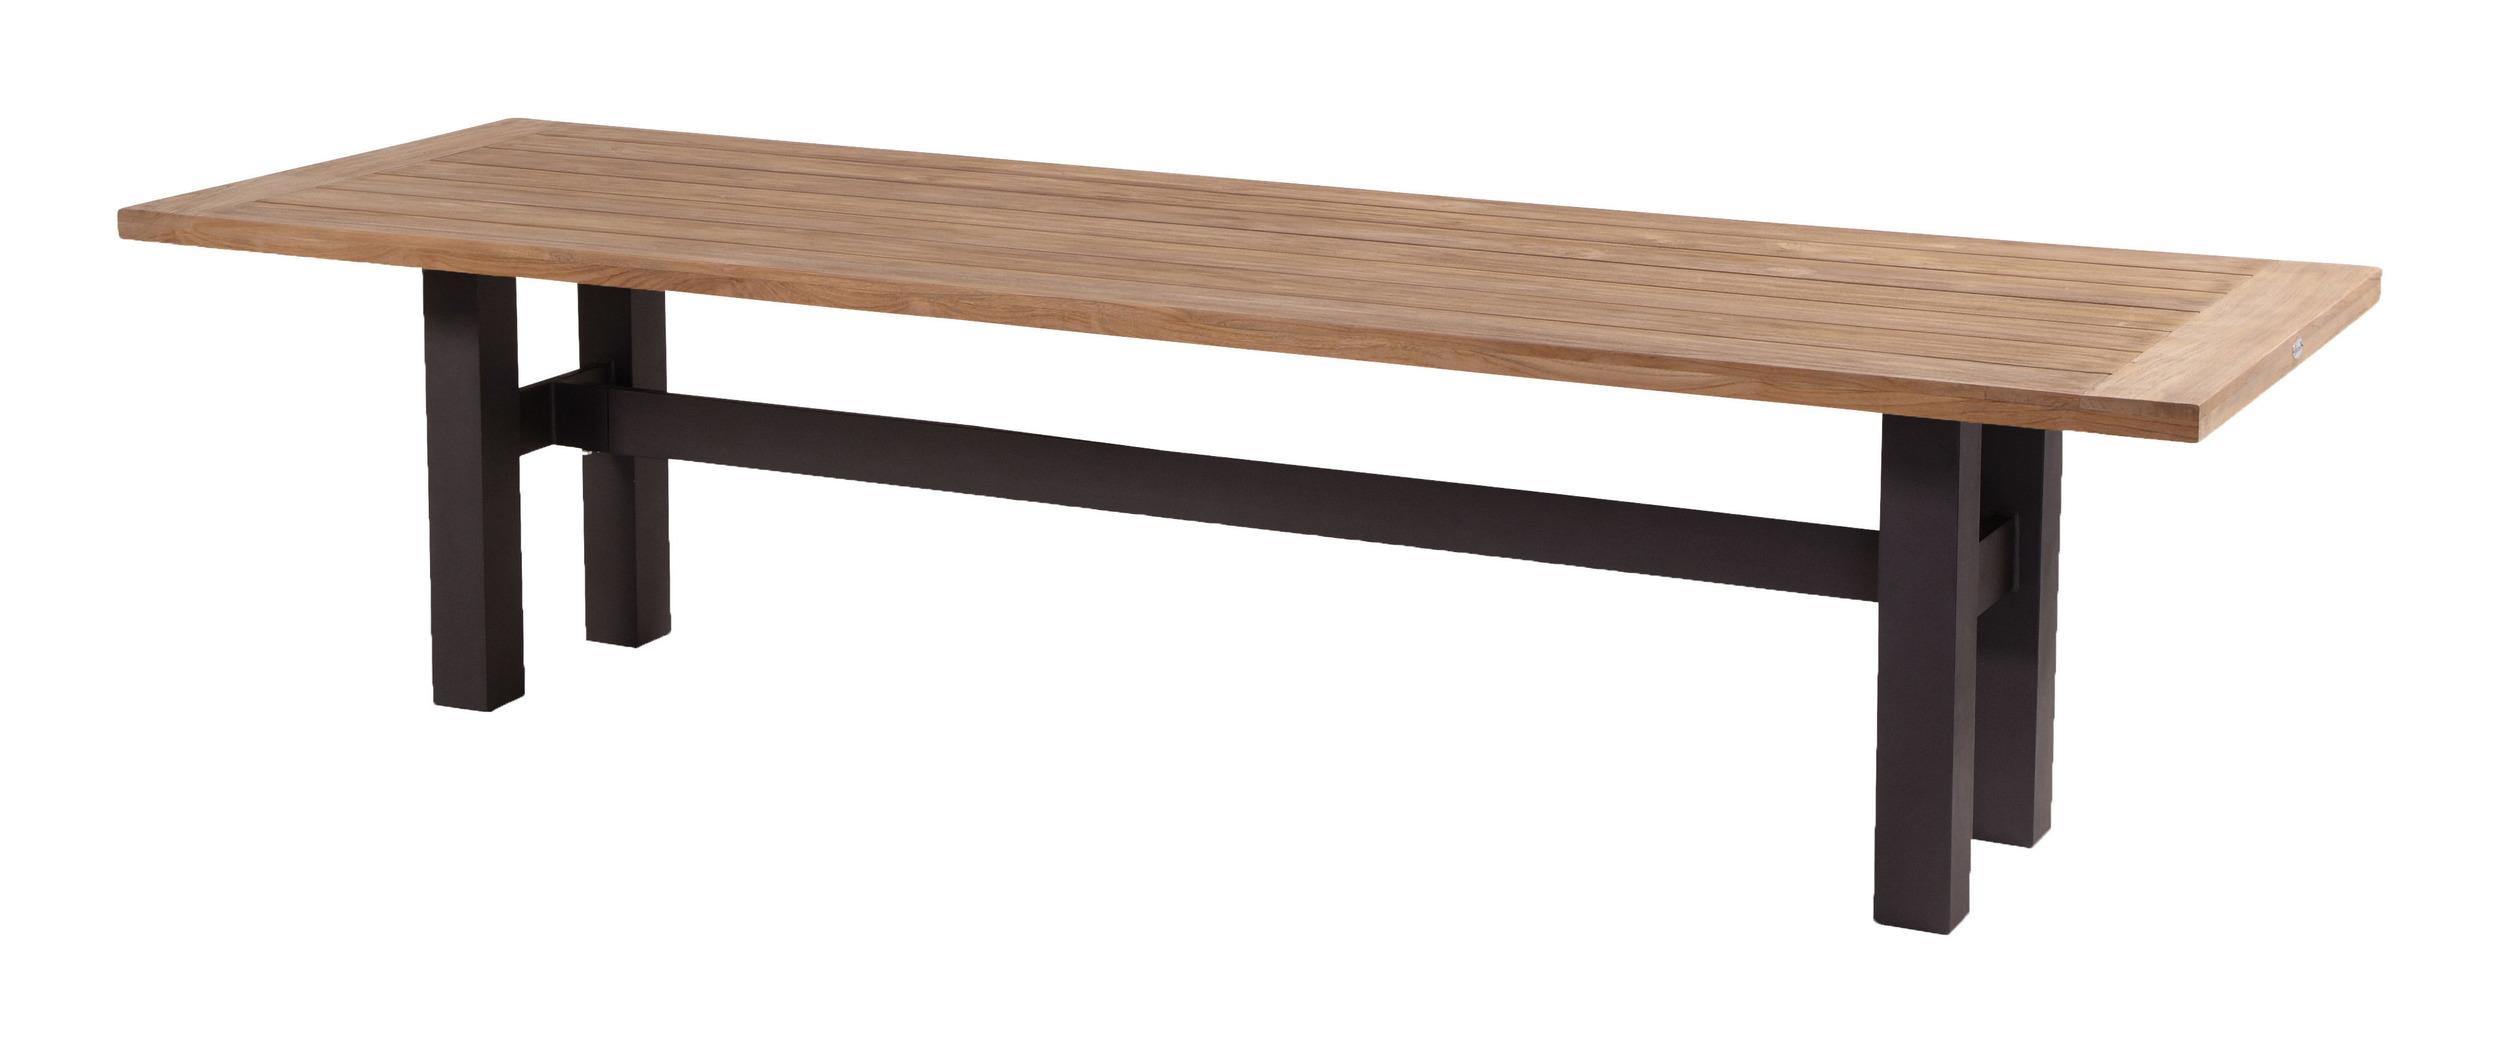 Hartman Tuintafel 'Sophie Yasmani' 300 x 100cm, kleur Zwart